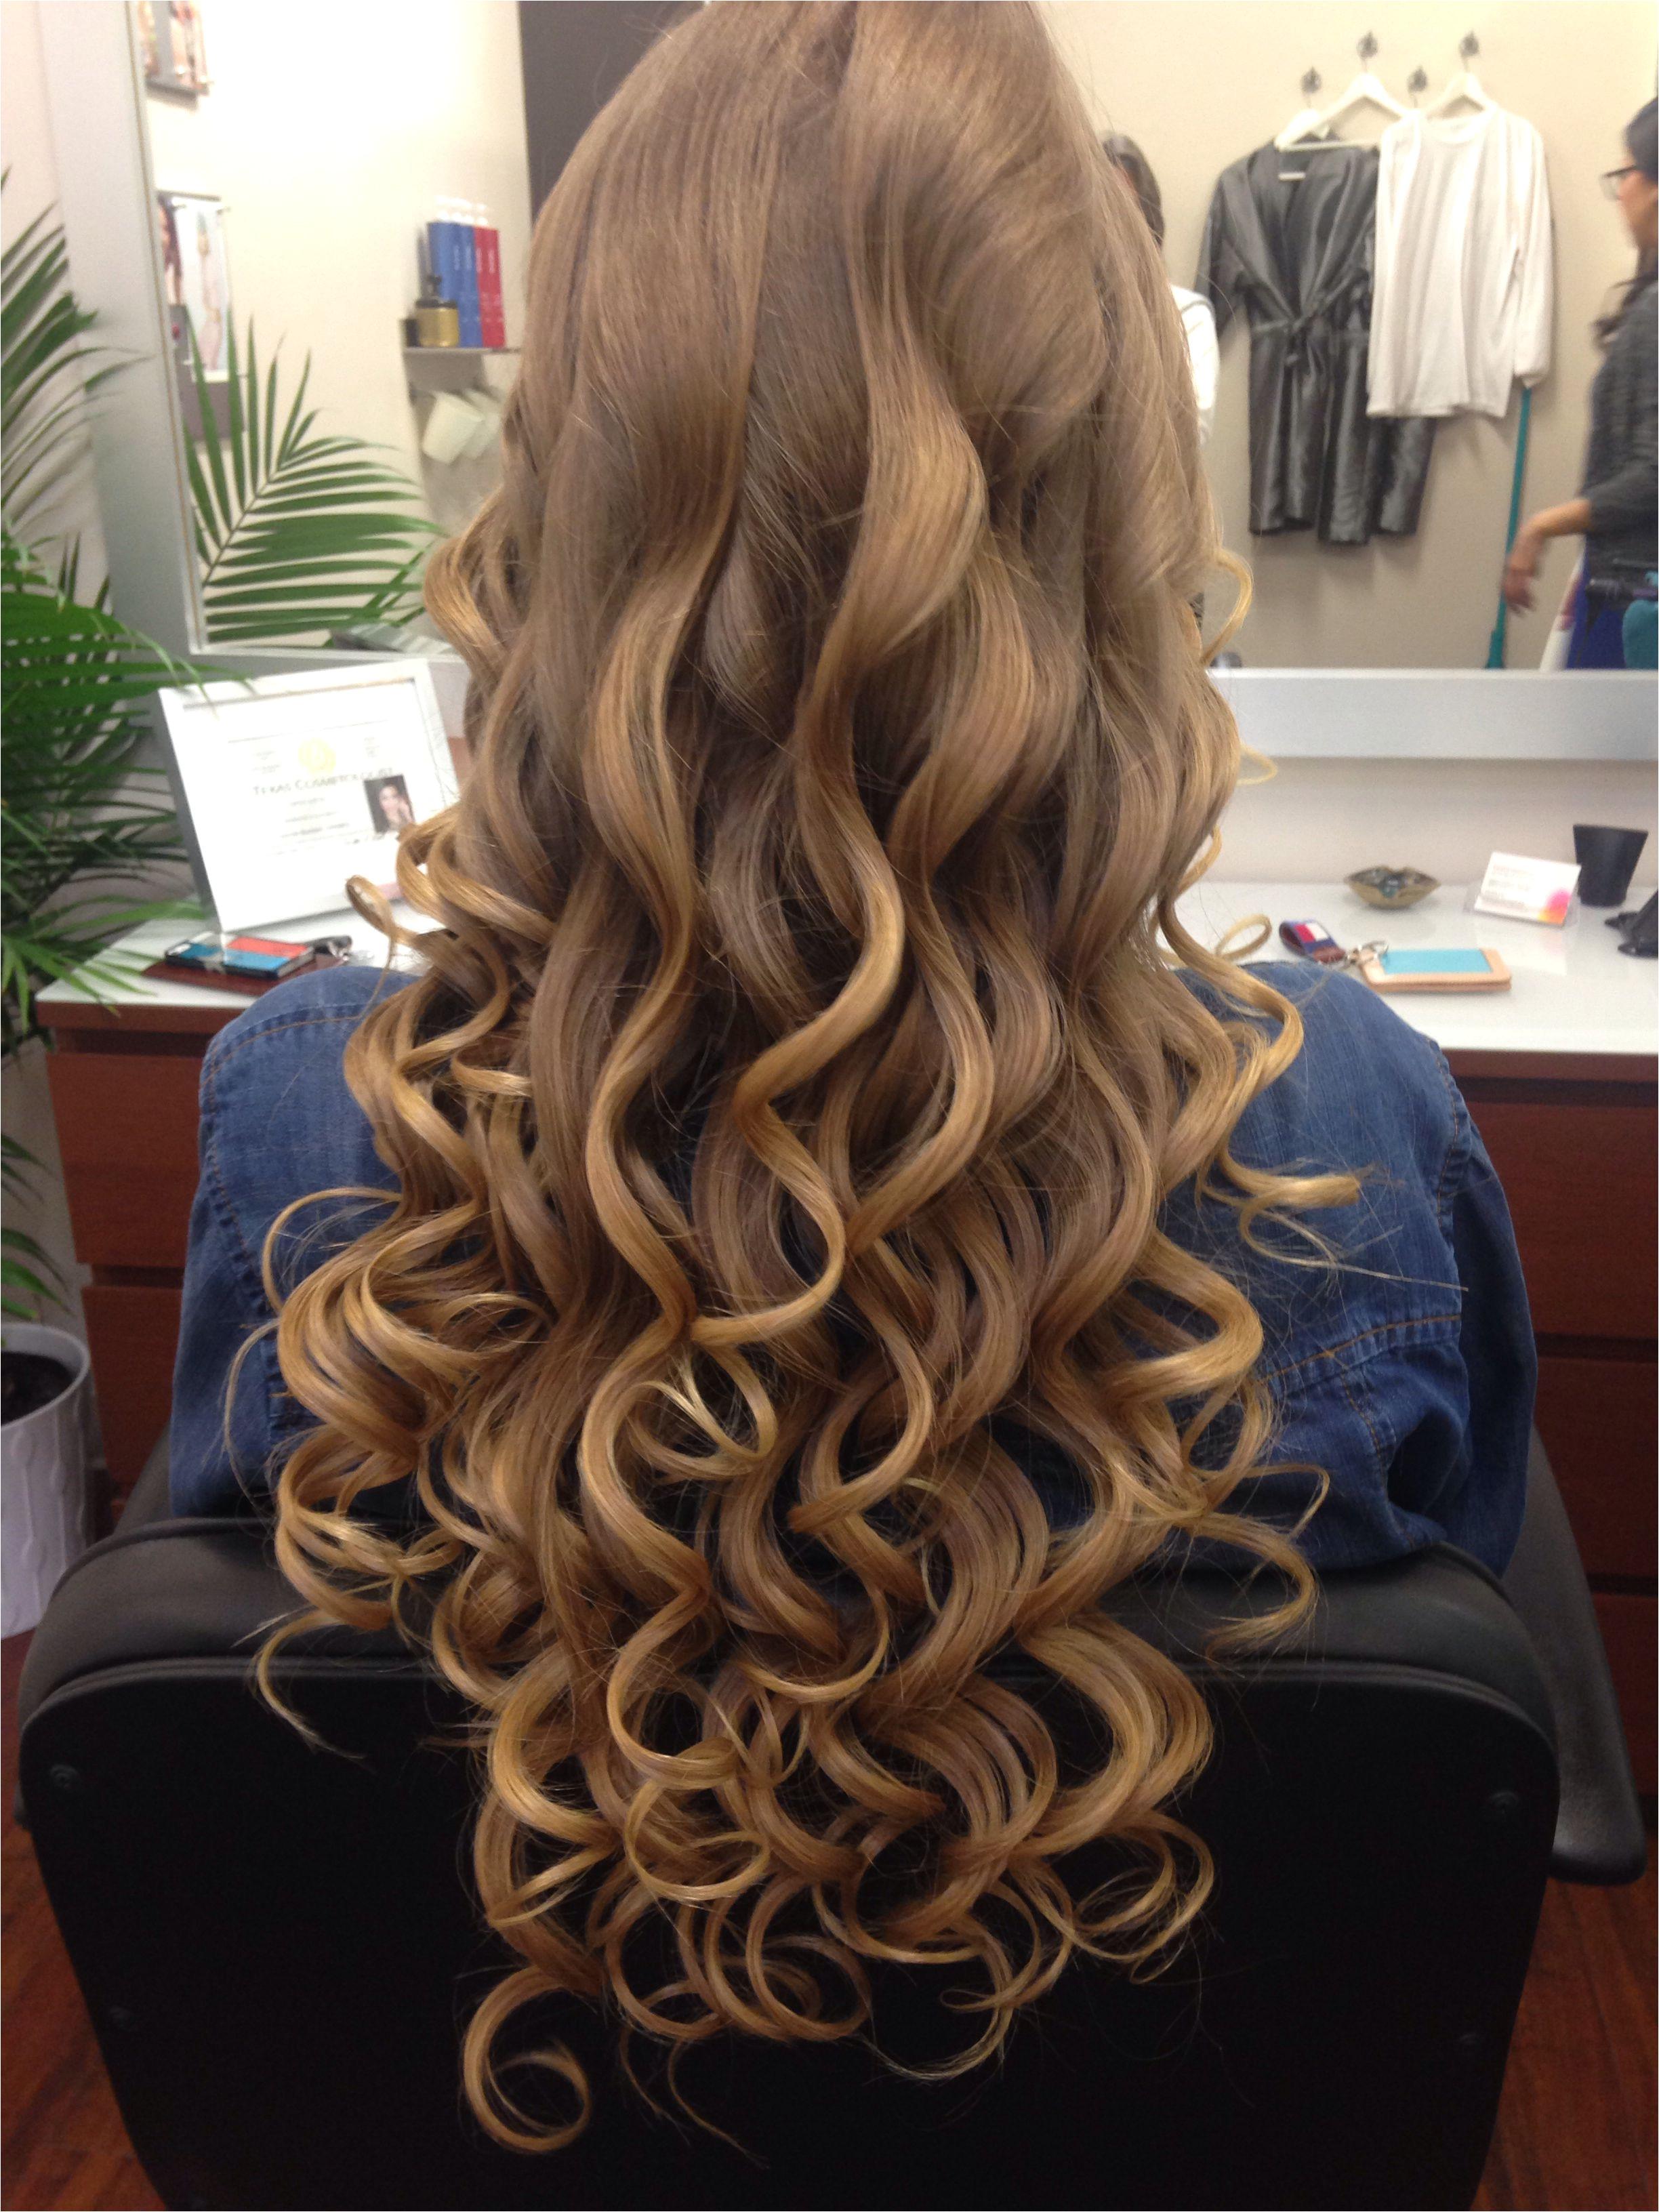 Prom hair Formal Hairdos Formal Hairstyles Down Hairstyles Long Loose Curls Let